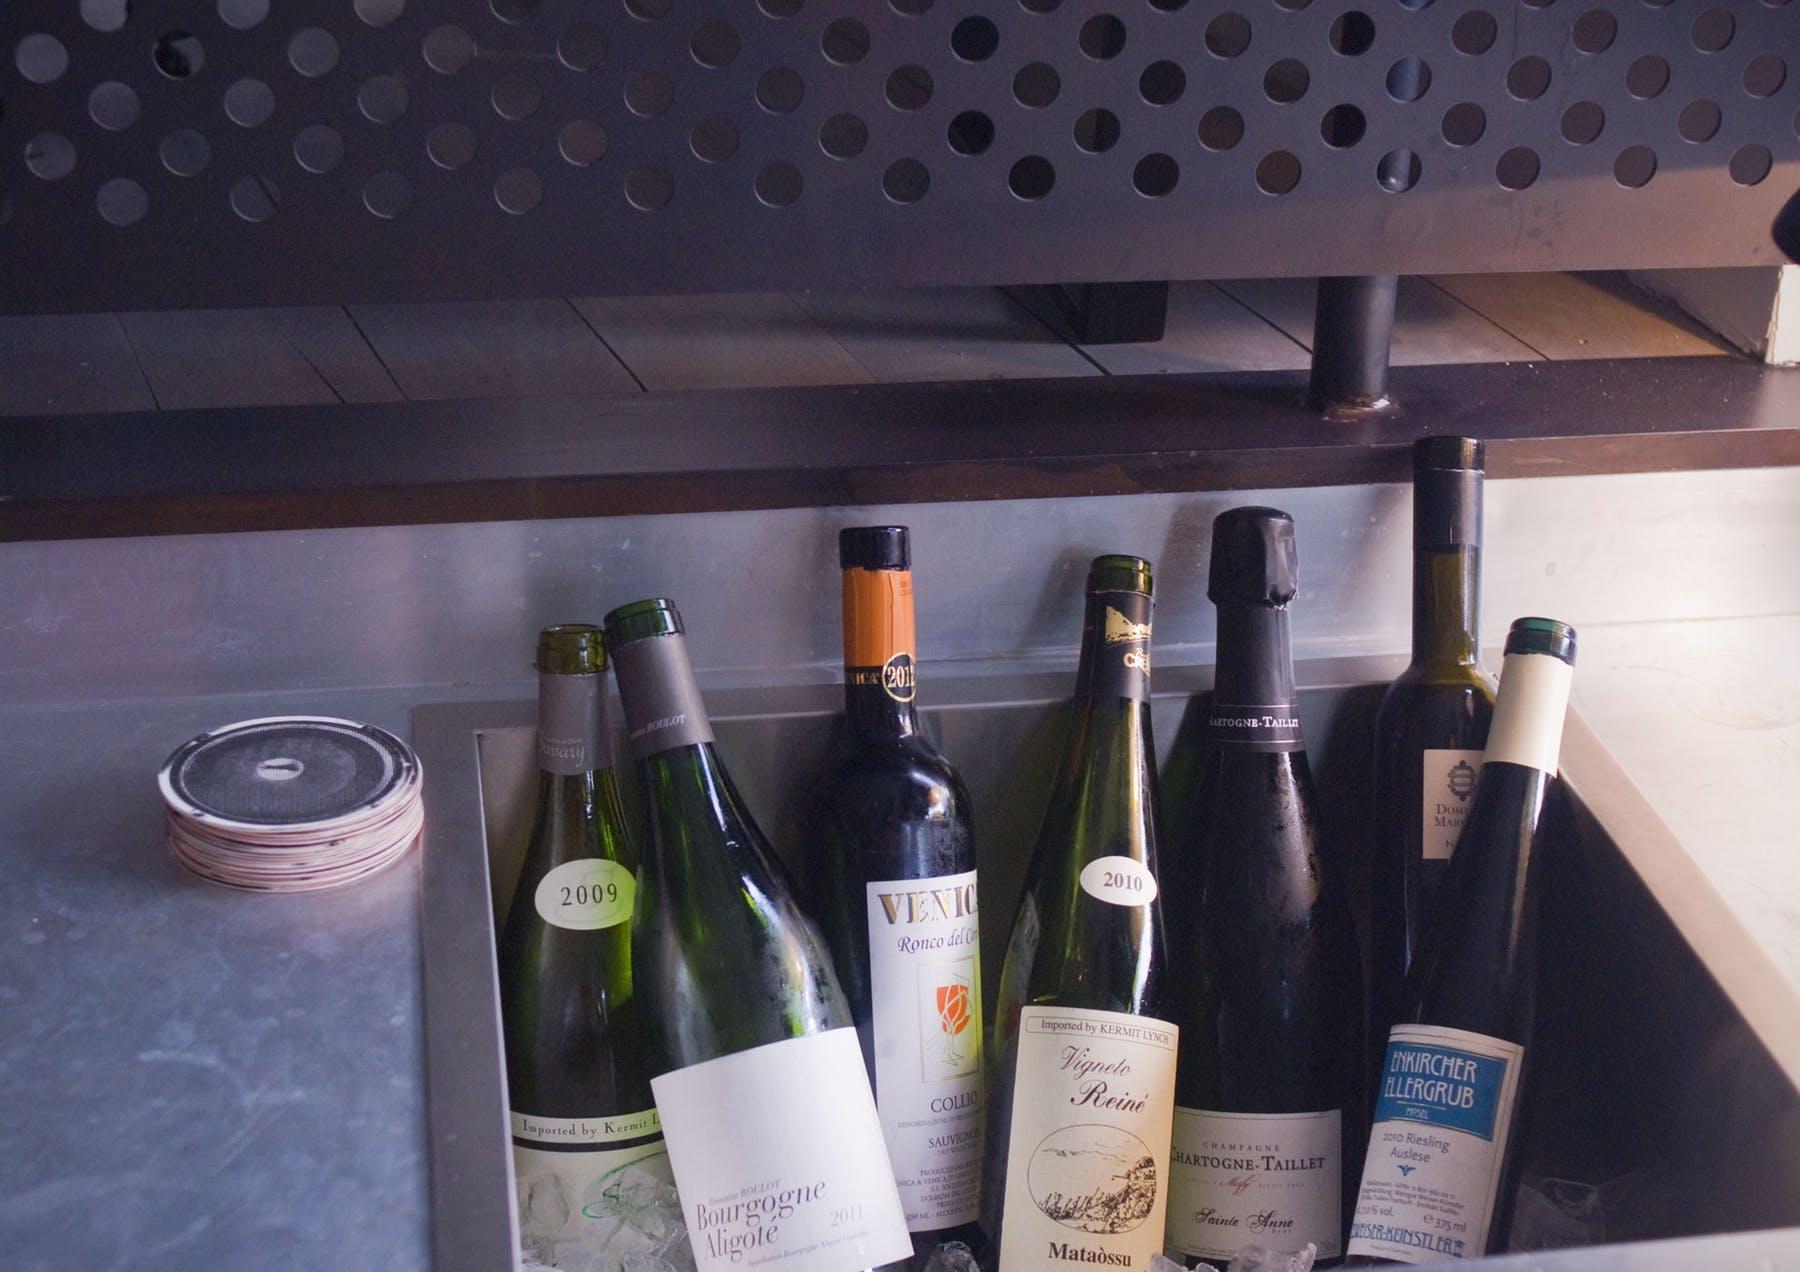 display of wine